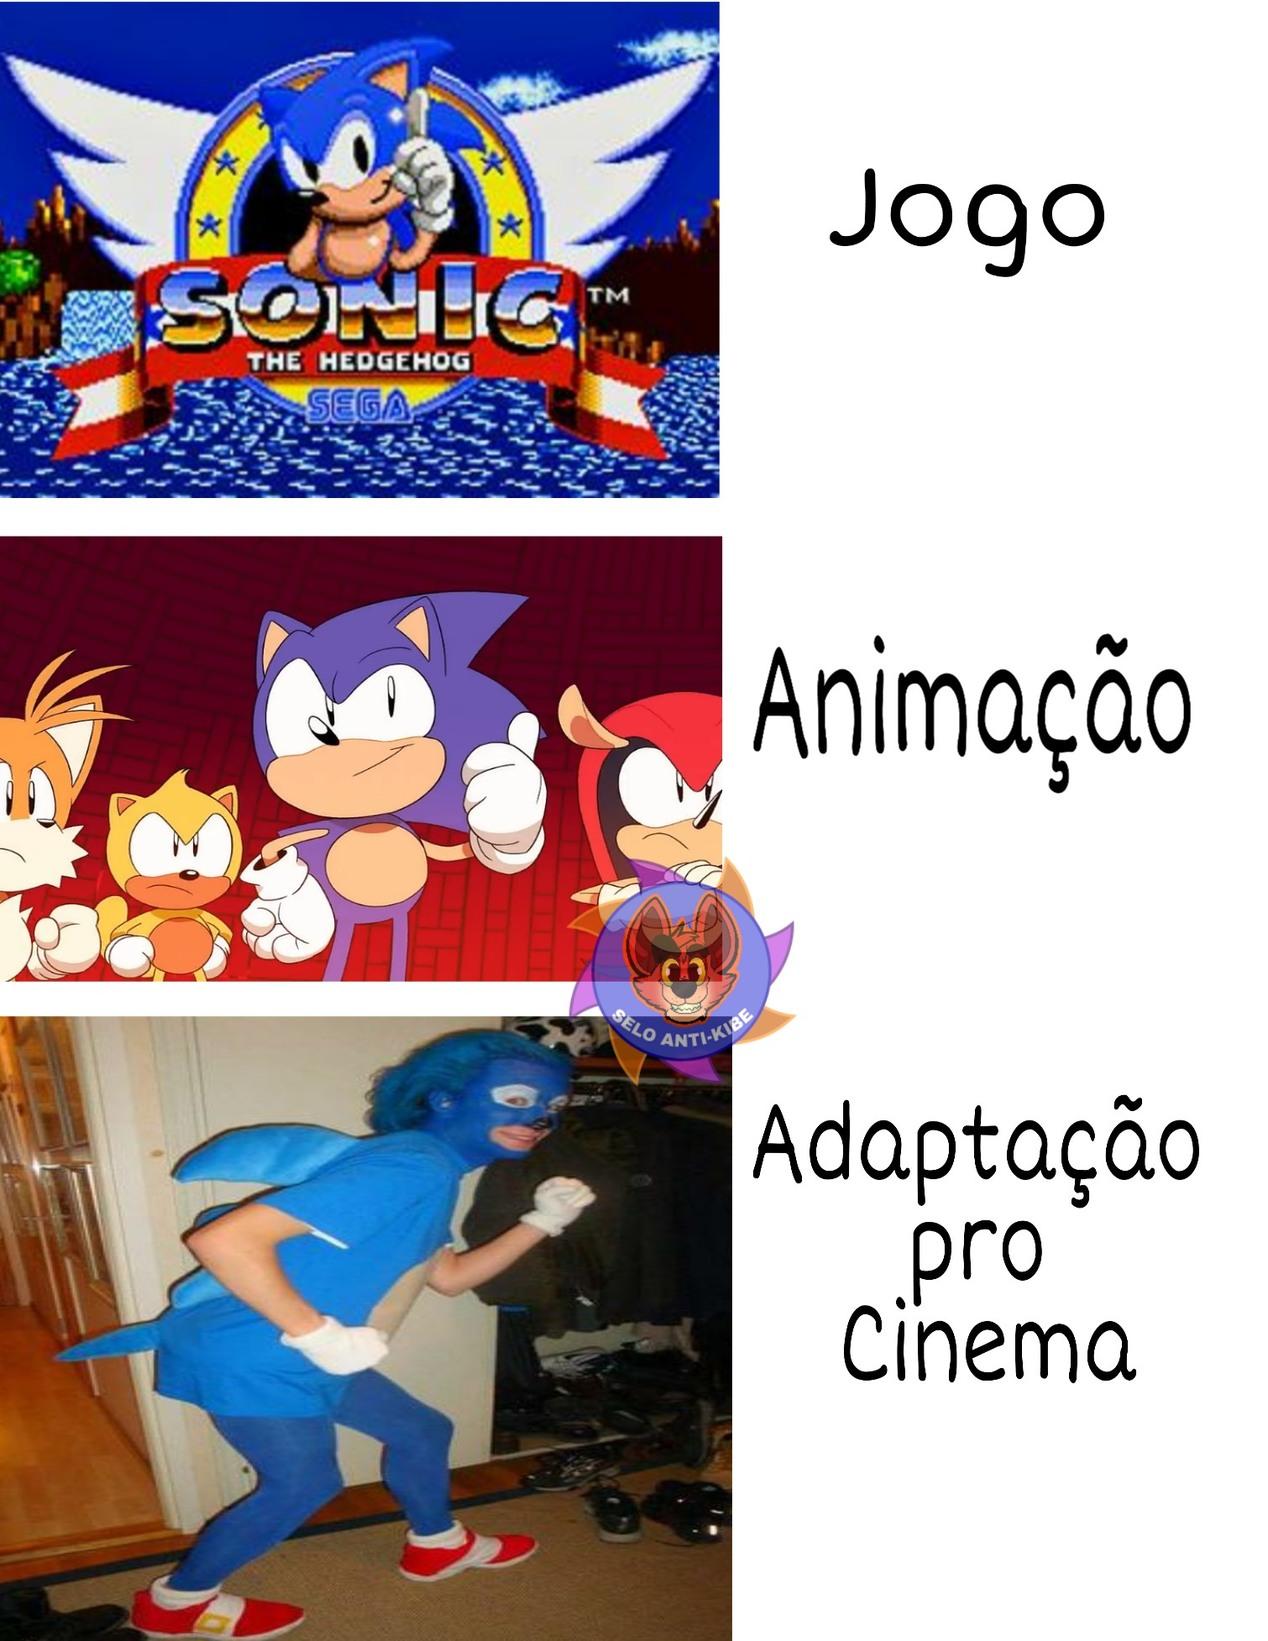 AGAHAU4HSIWMGOLEFK - meme